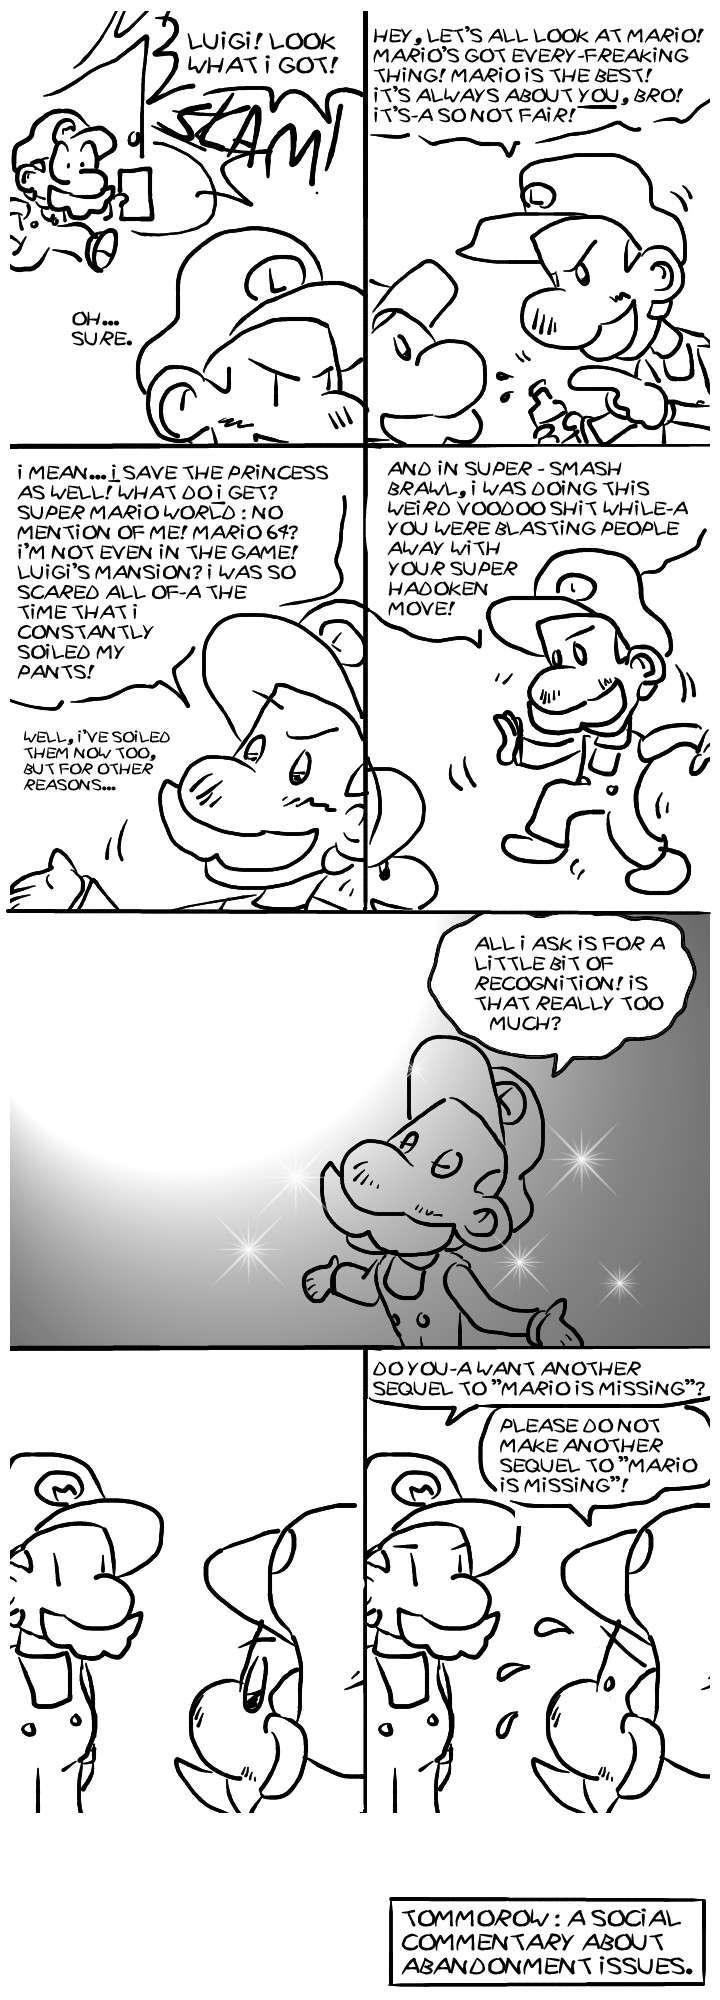 Hey, it's Fakafon again. - Page 5 Drunke10